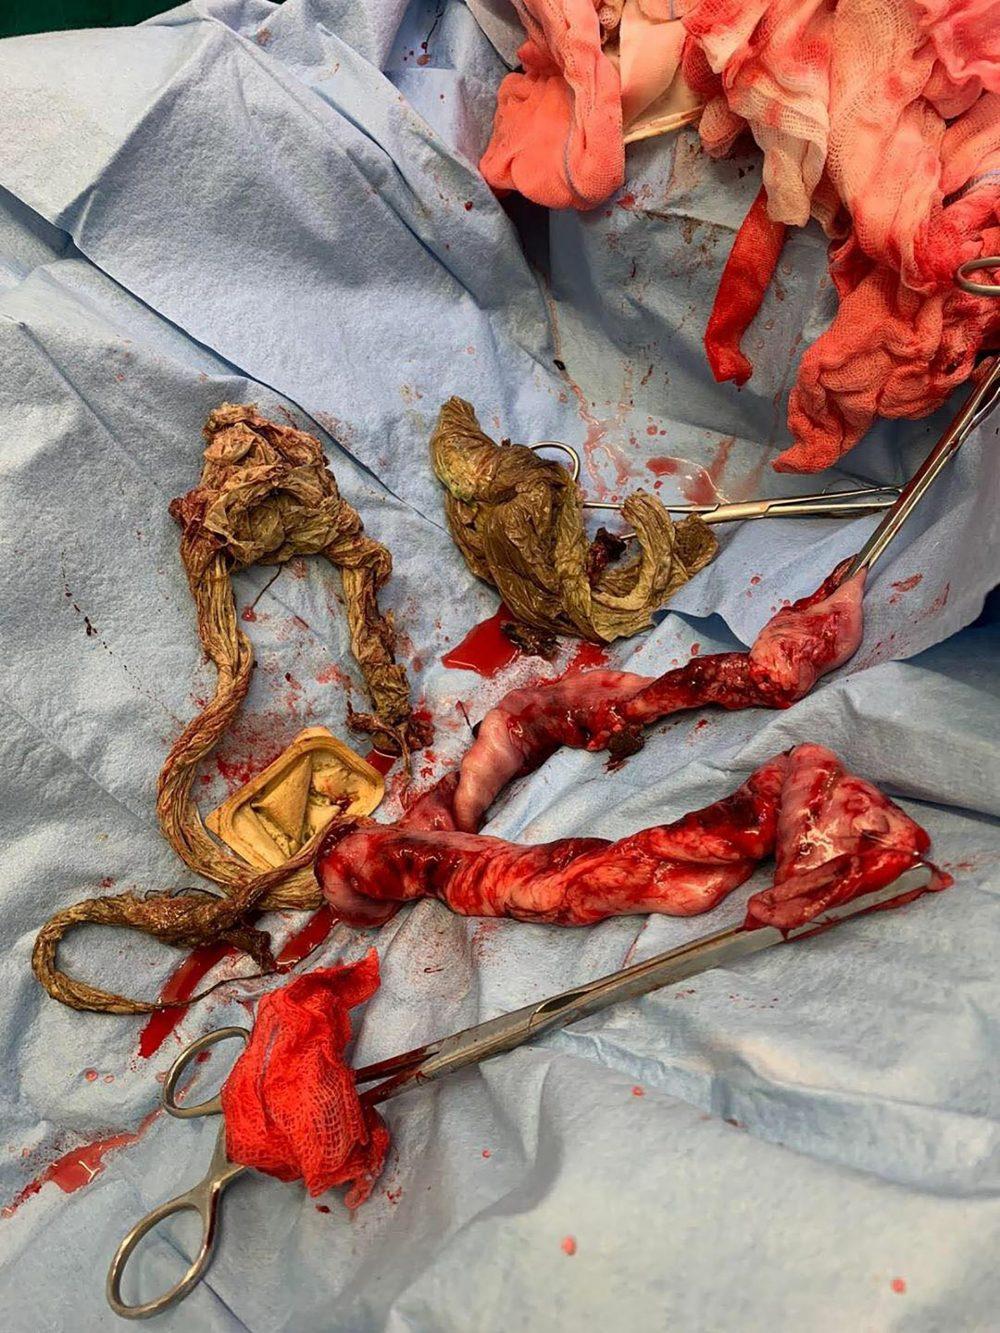 Vets had to remove 18 inches of Milo's intestine - Animal News Scotland